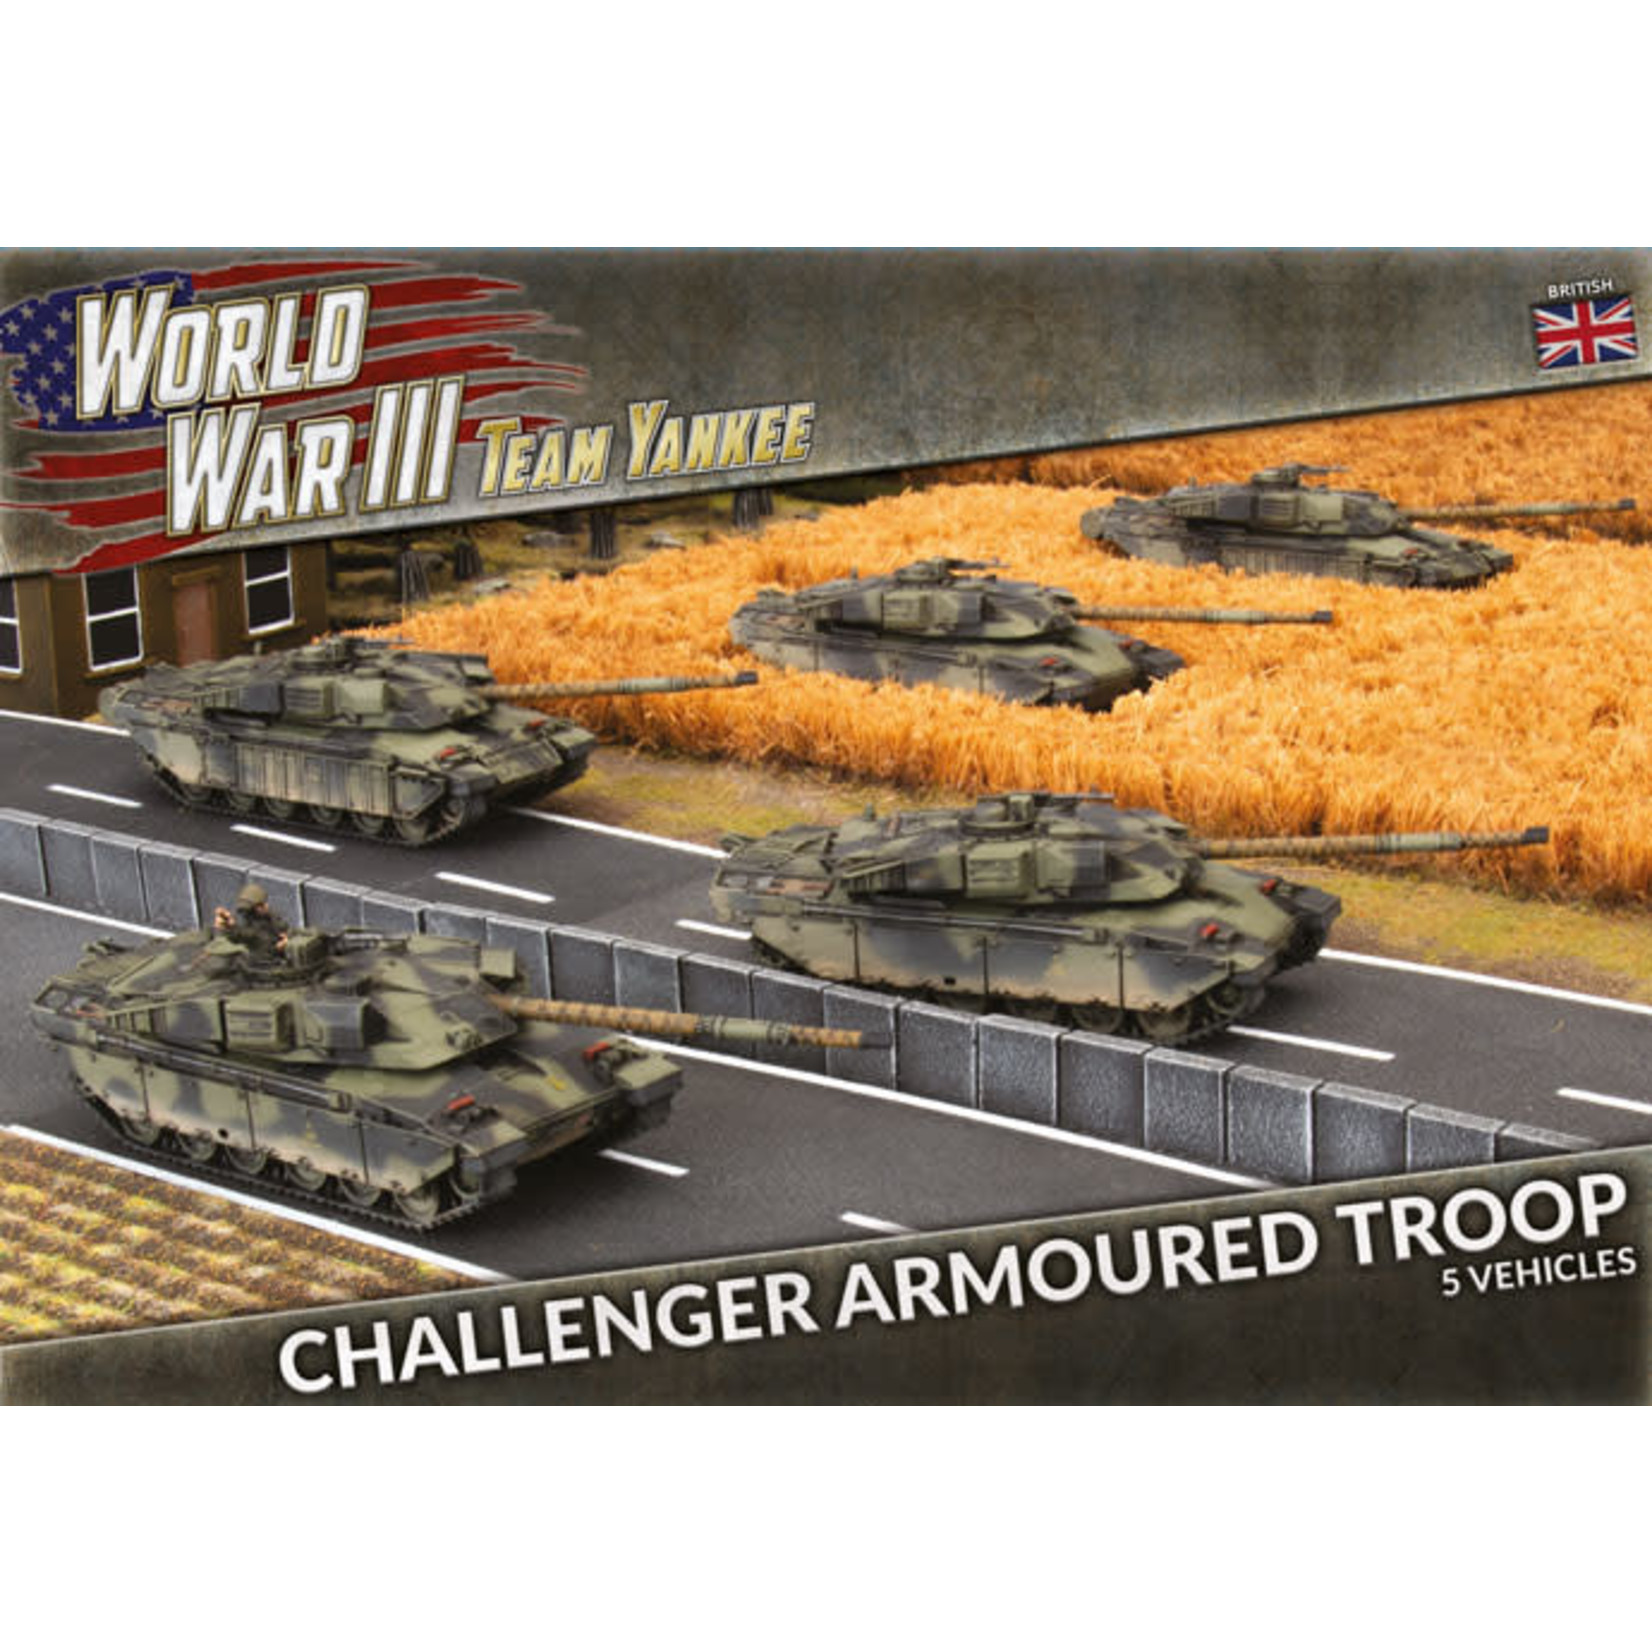 Battlefront Miniatures Ltd Team Yankee - World War III   Challenger Armoured Troop